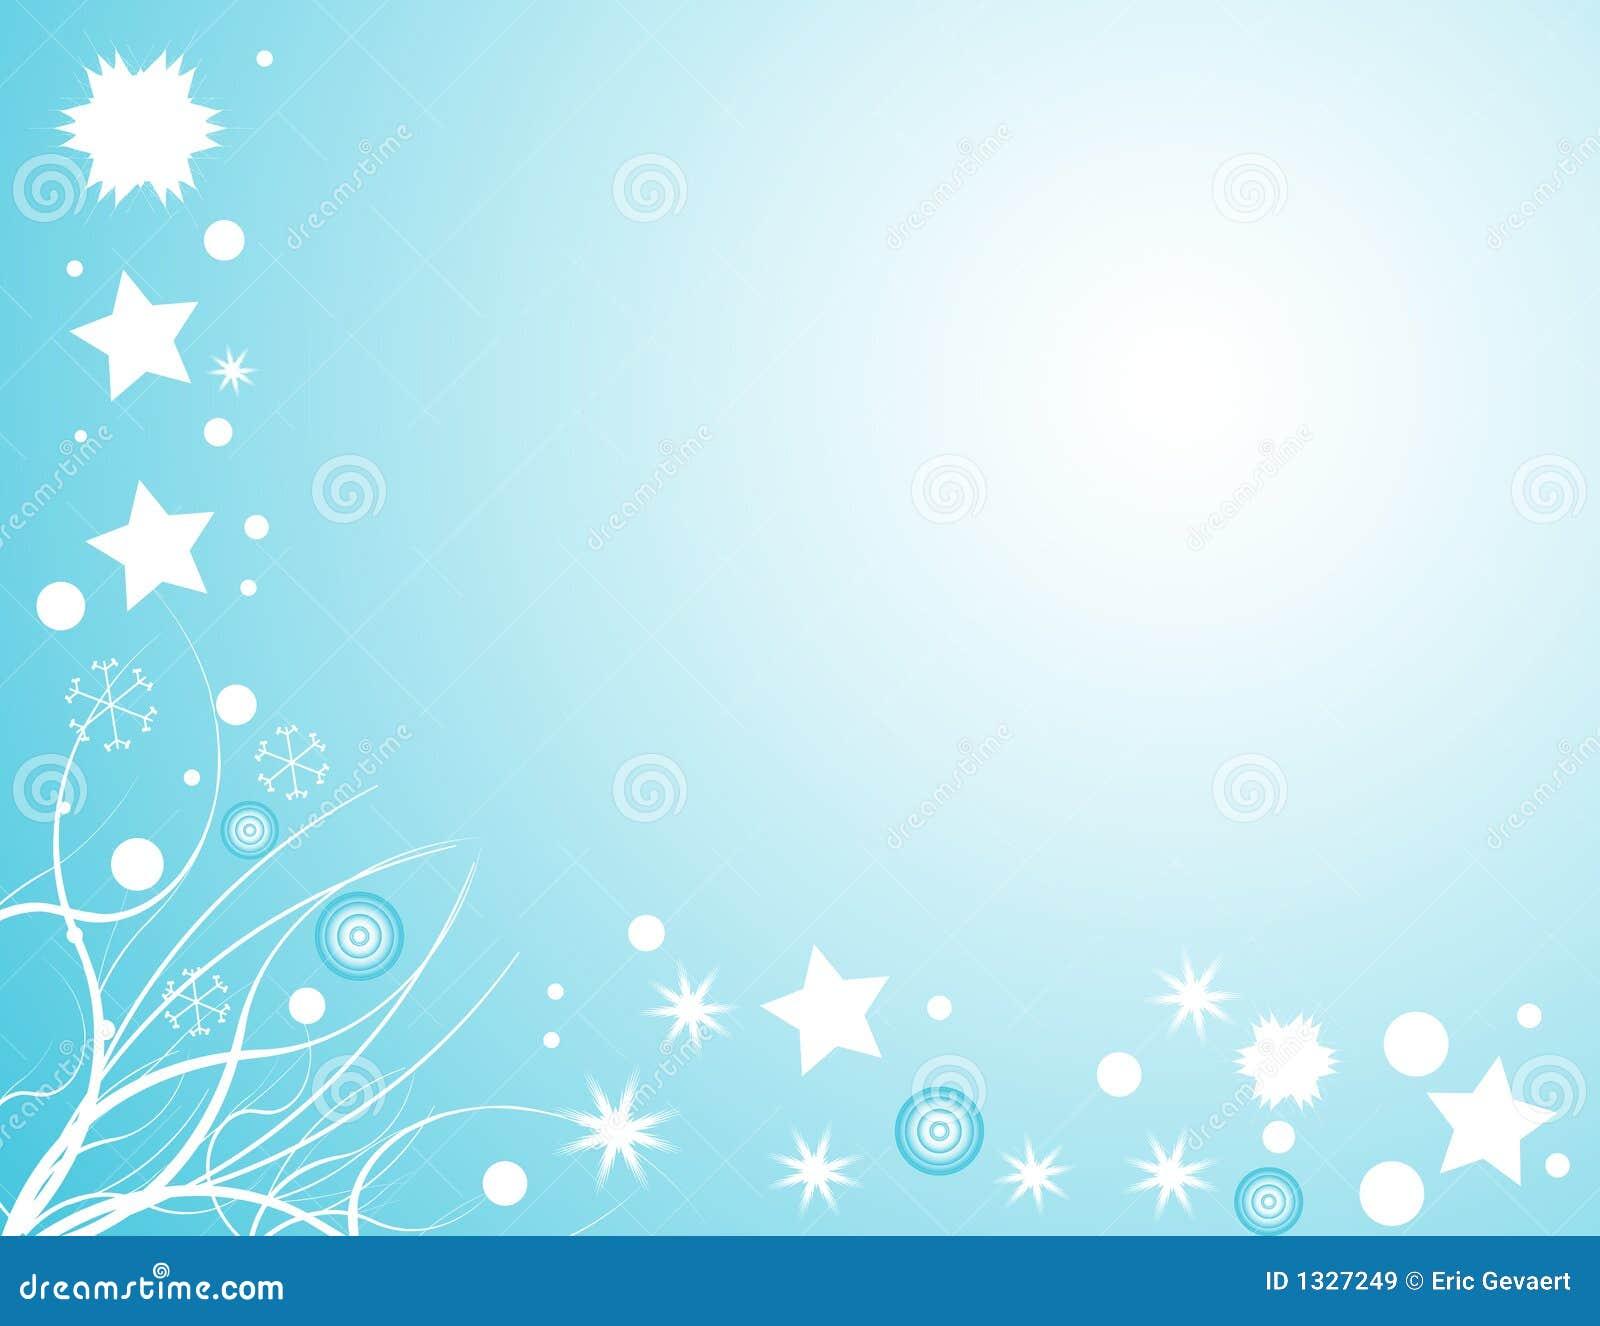 Christmas tree snow decoration - Winter Snow Design Royalty Free Stock Images Image 1327249